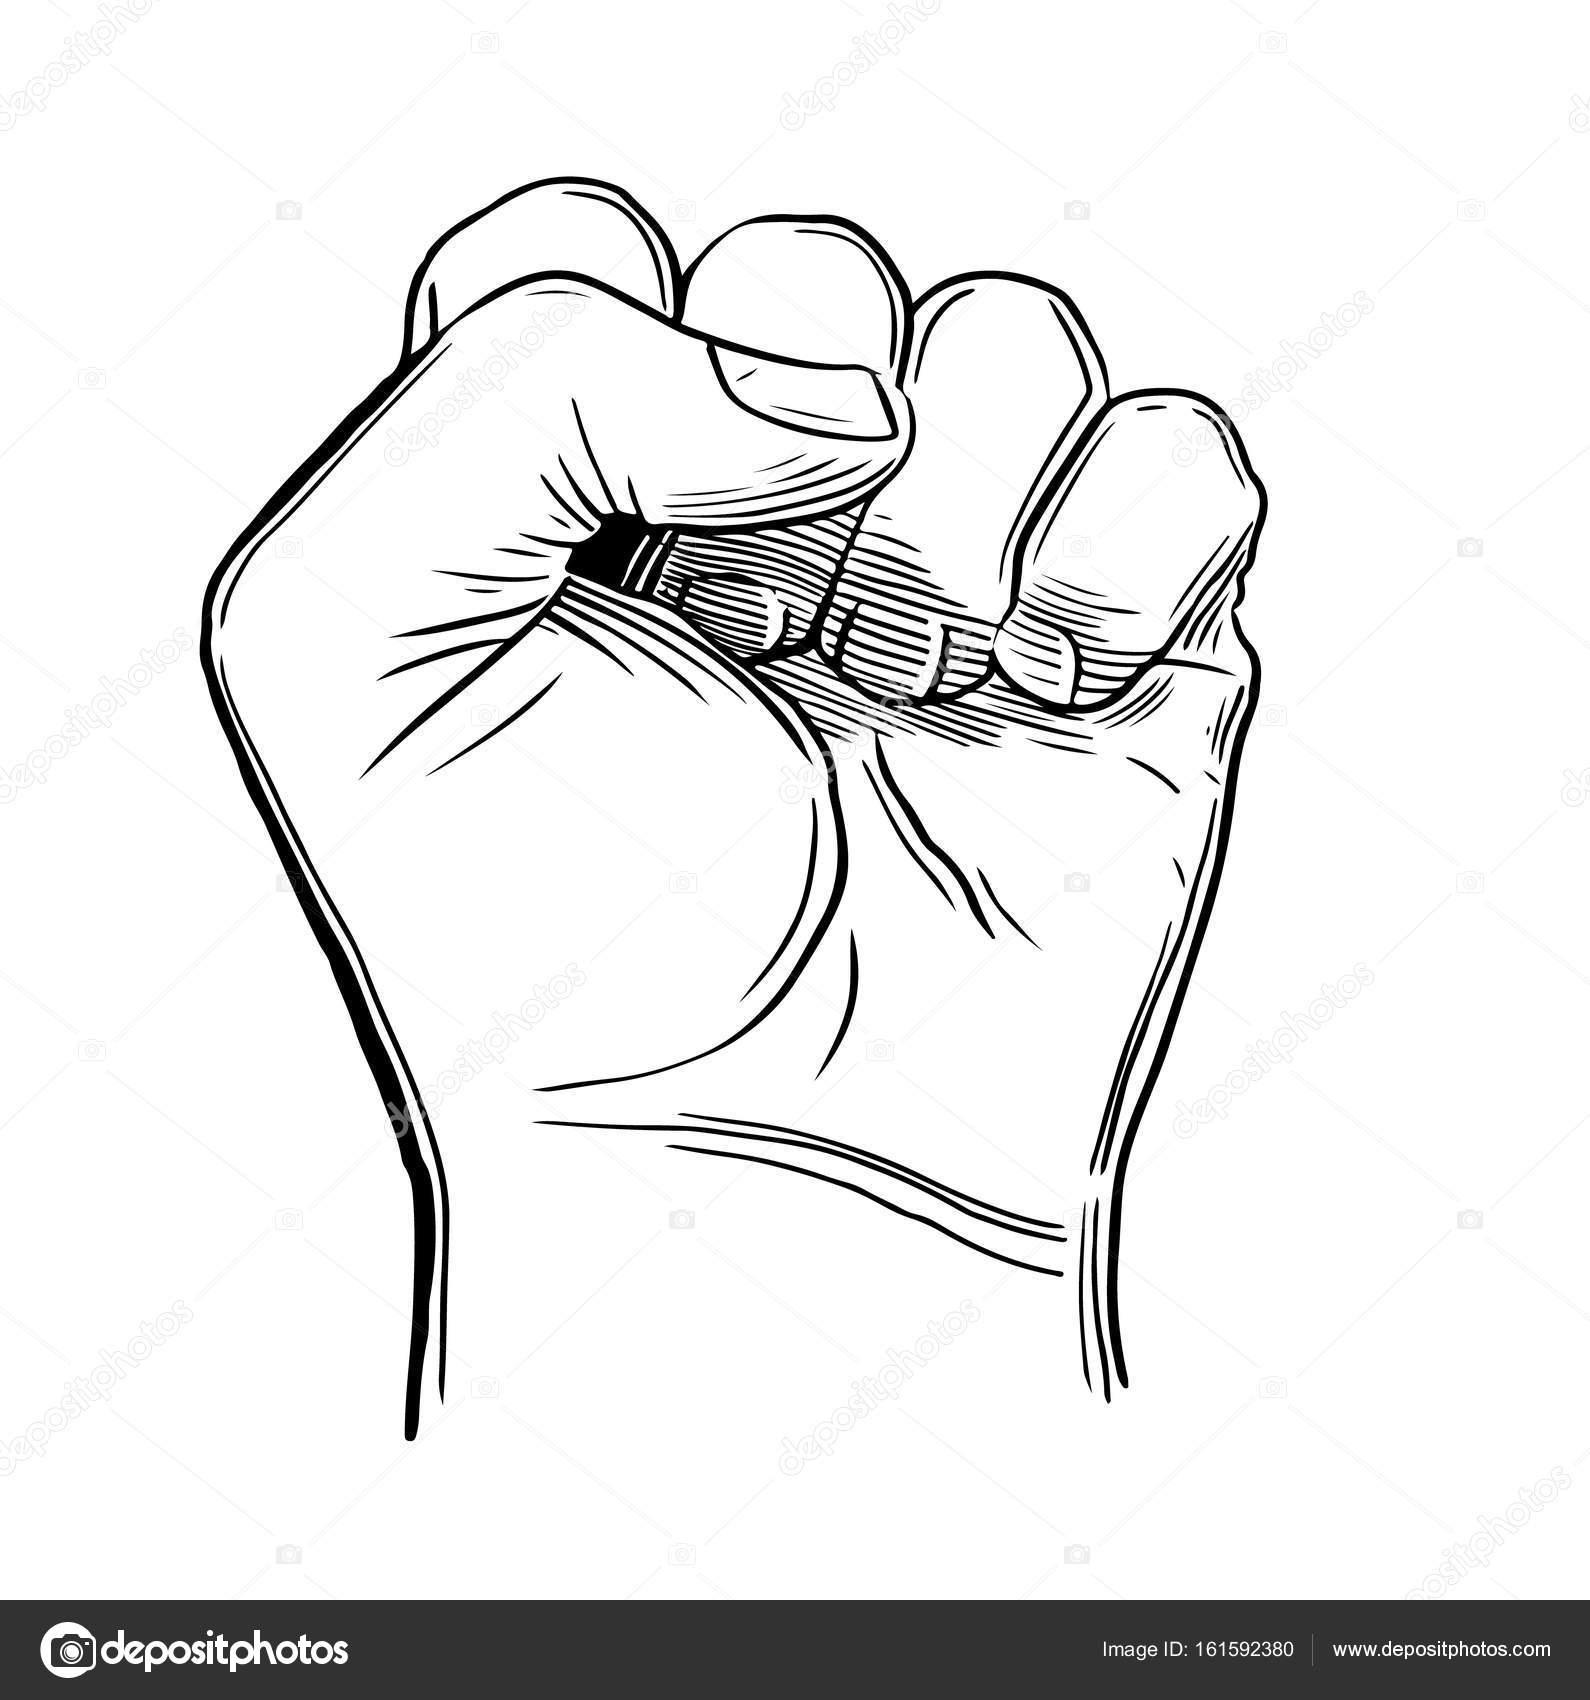 1590x1700 Sketch Drawing Fist Hand Gesture Stock Vector Lastrooo